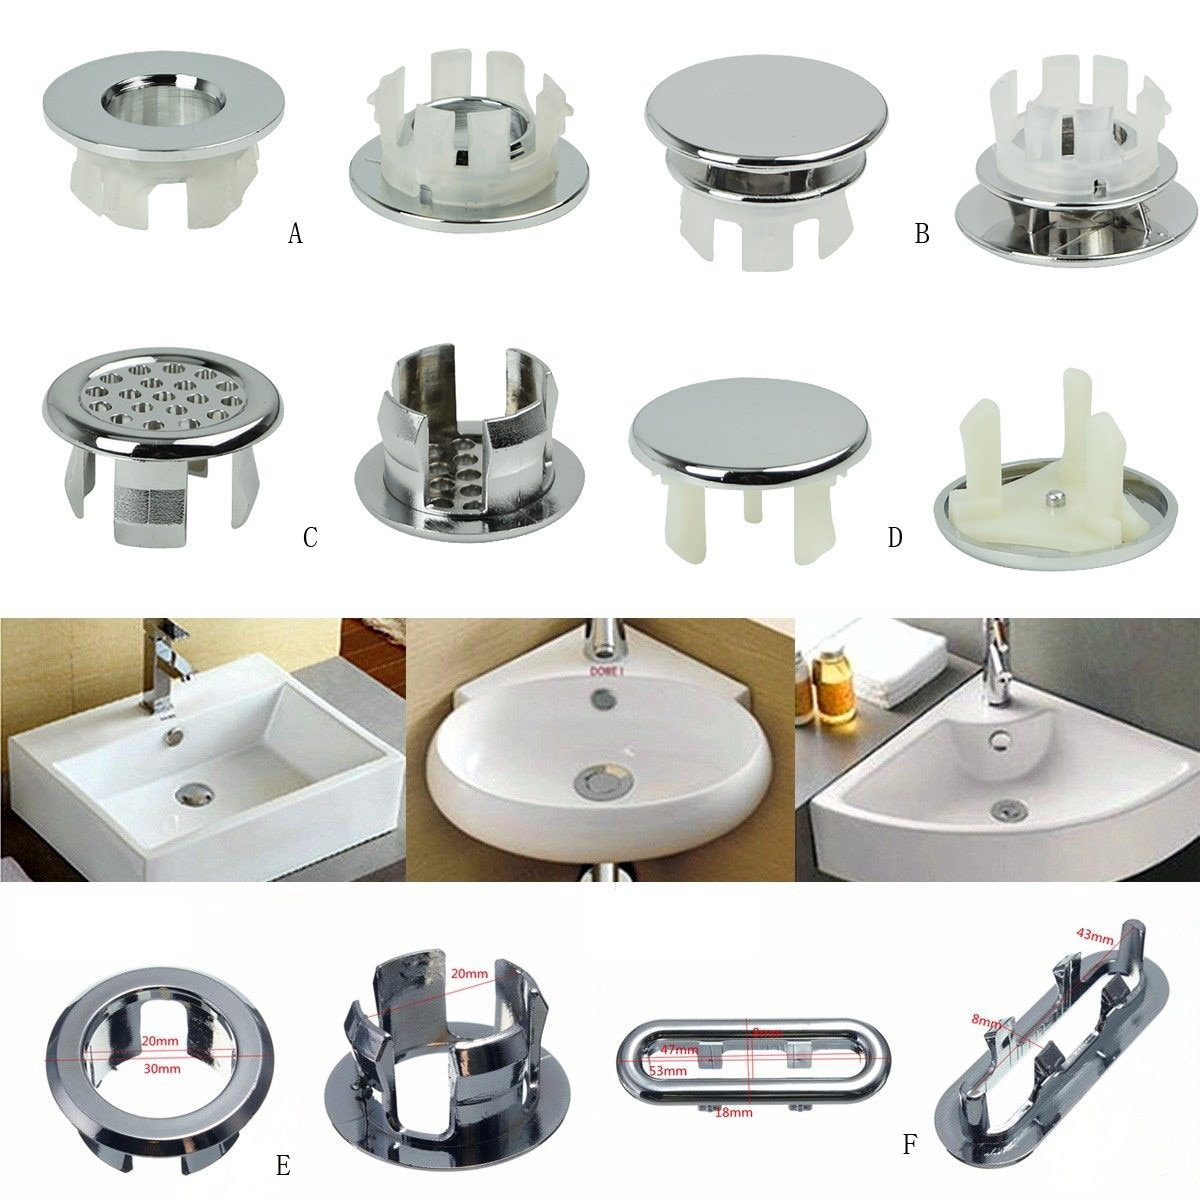 Bathroom Ceramic Basin Overflow Cover Bathroom Assoeted Chrome Trim Sink Overflow Spare Cover Basin Overflow Cover #25